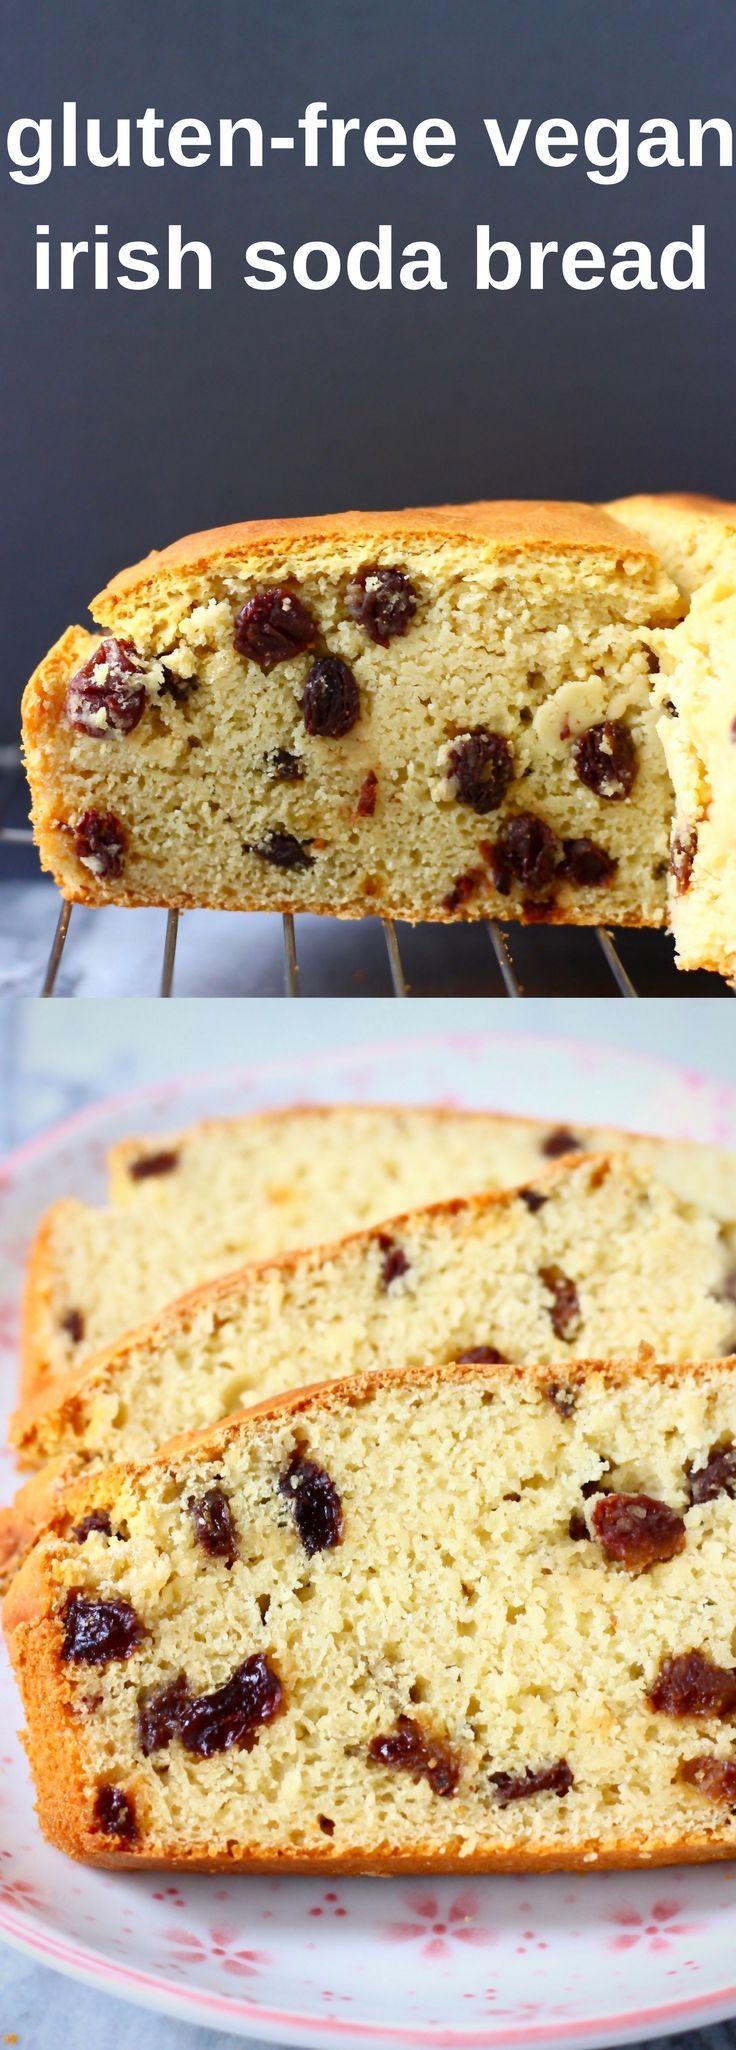 This GlutenFree Vegan Irish Soda Bread is seriously easy